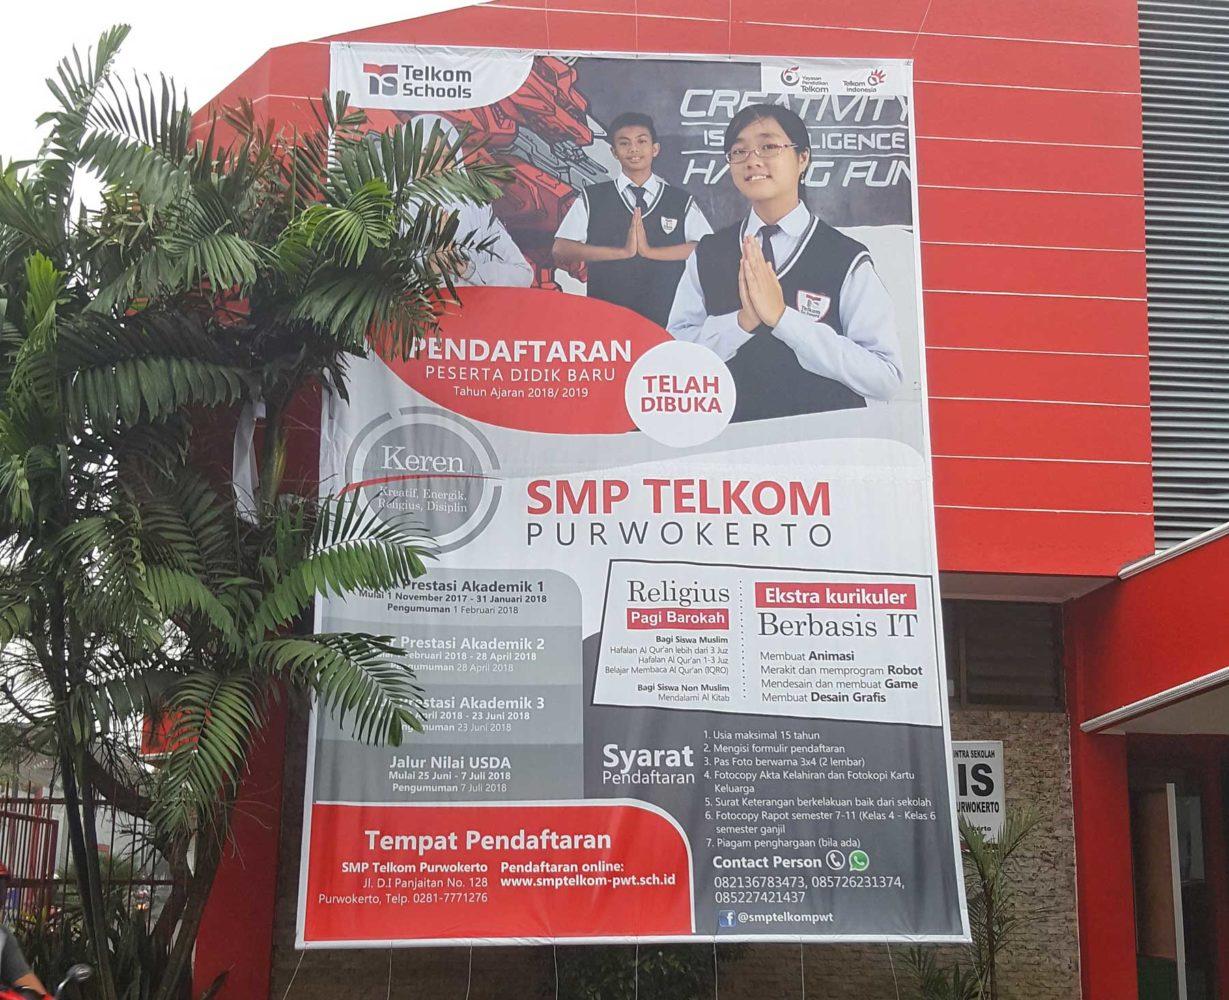 Informasi Pendaftaran SMP Telkom Purwokerto 2018